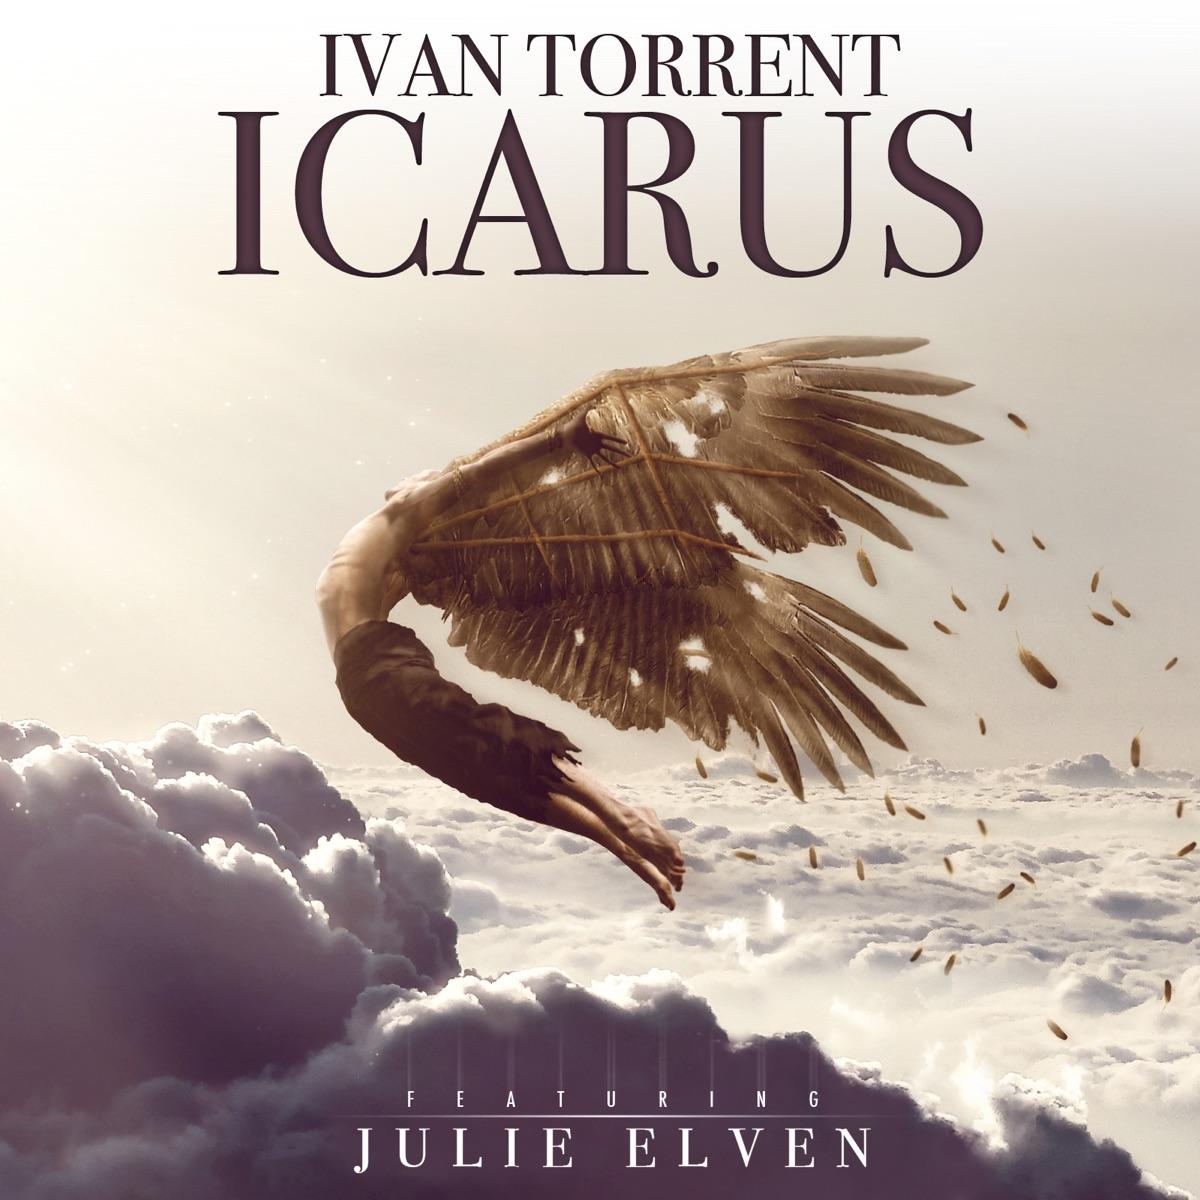 icarus album cover by ivan torrent